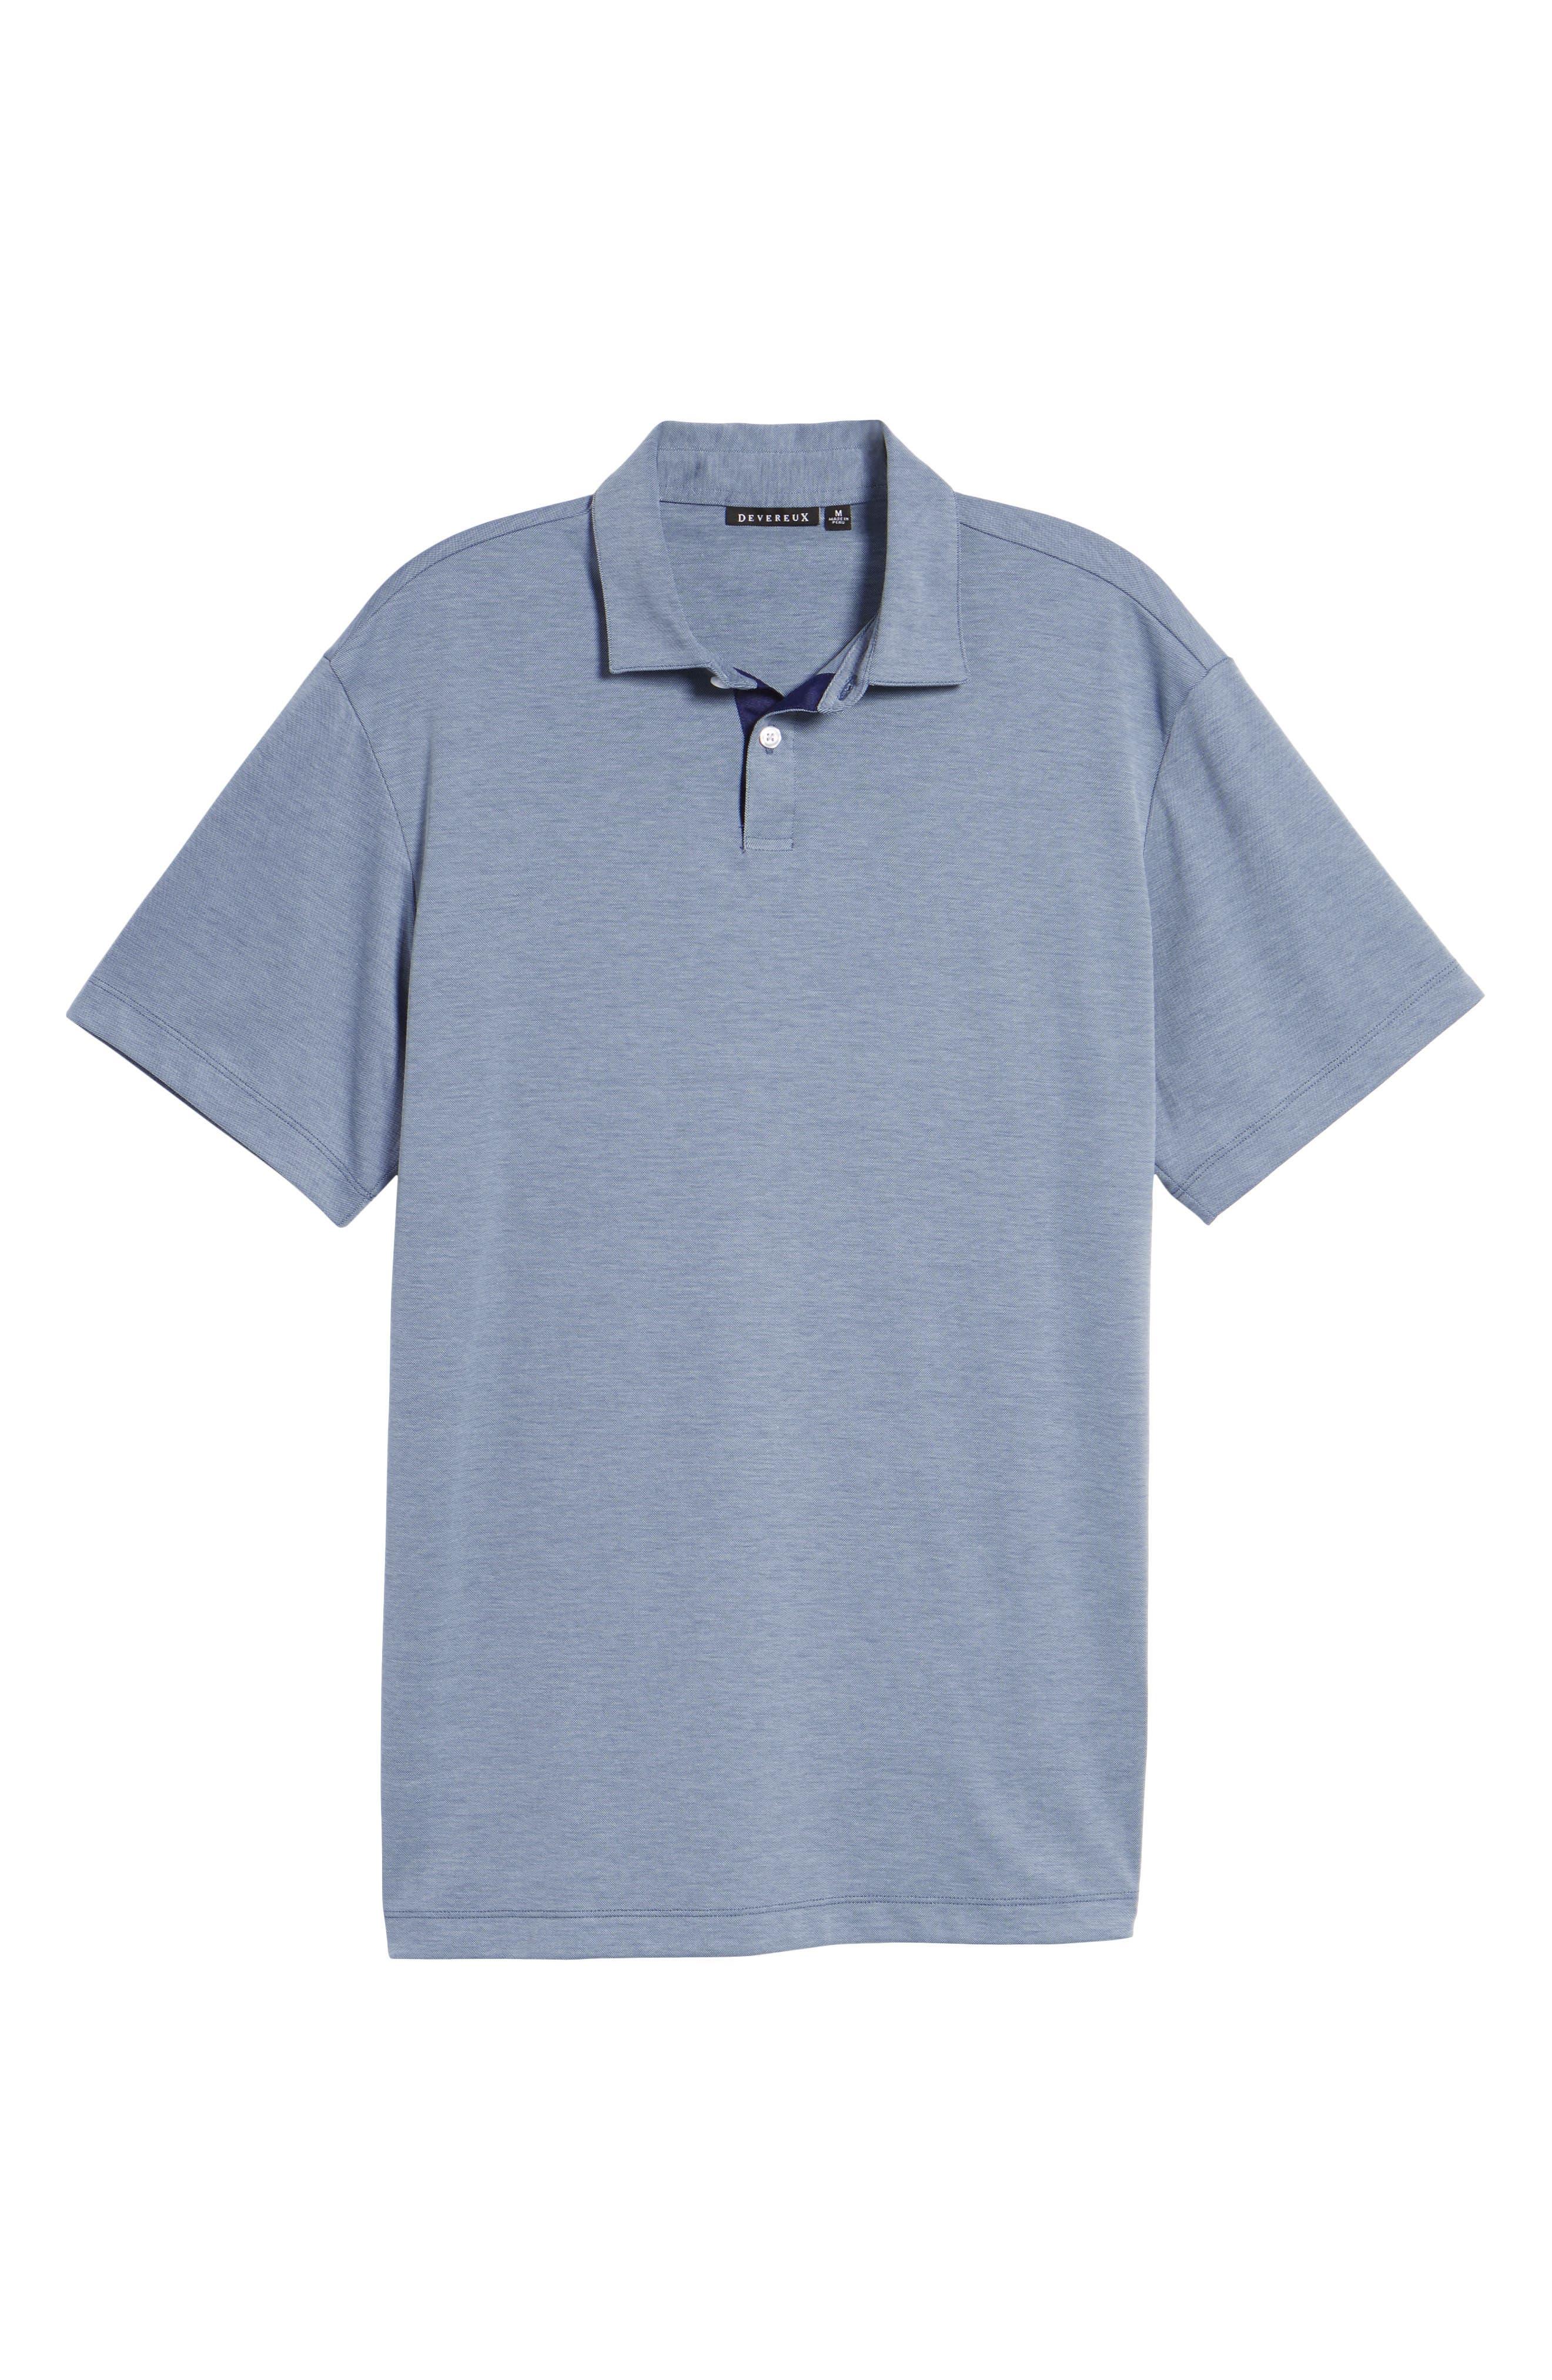 Andrew Regular Fit Piqué Polo,                             Alternate thumbnail 6, color,                             PURA VIDA BLUE